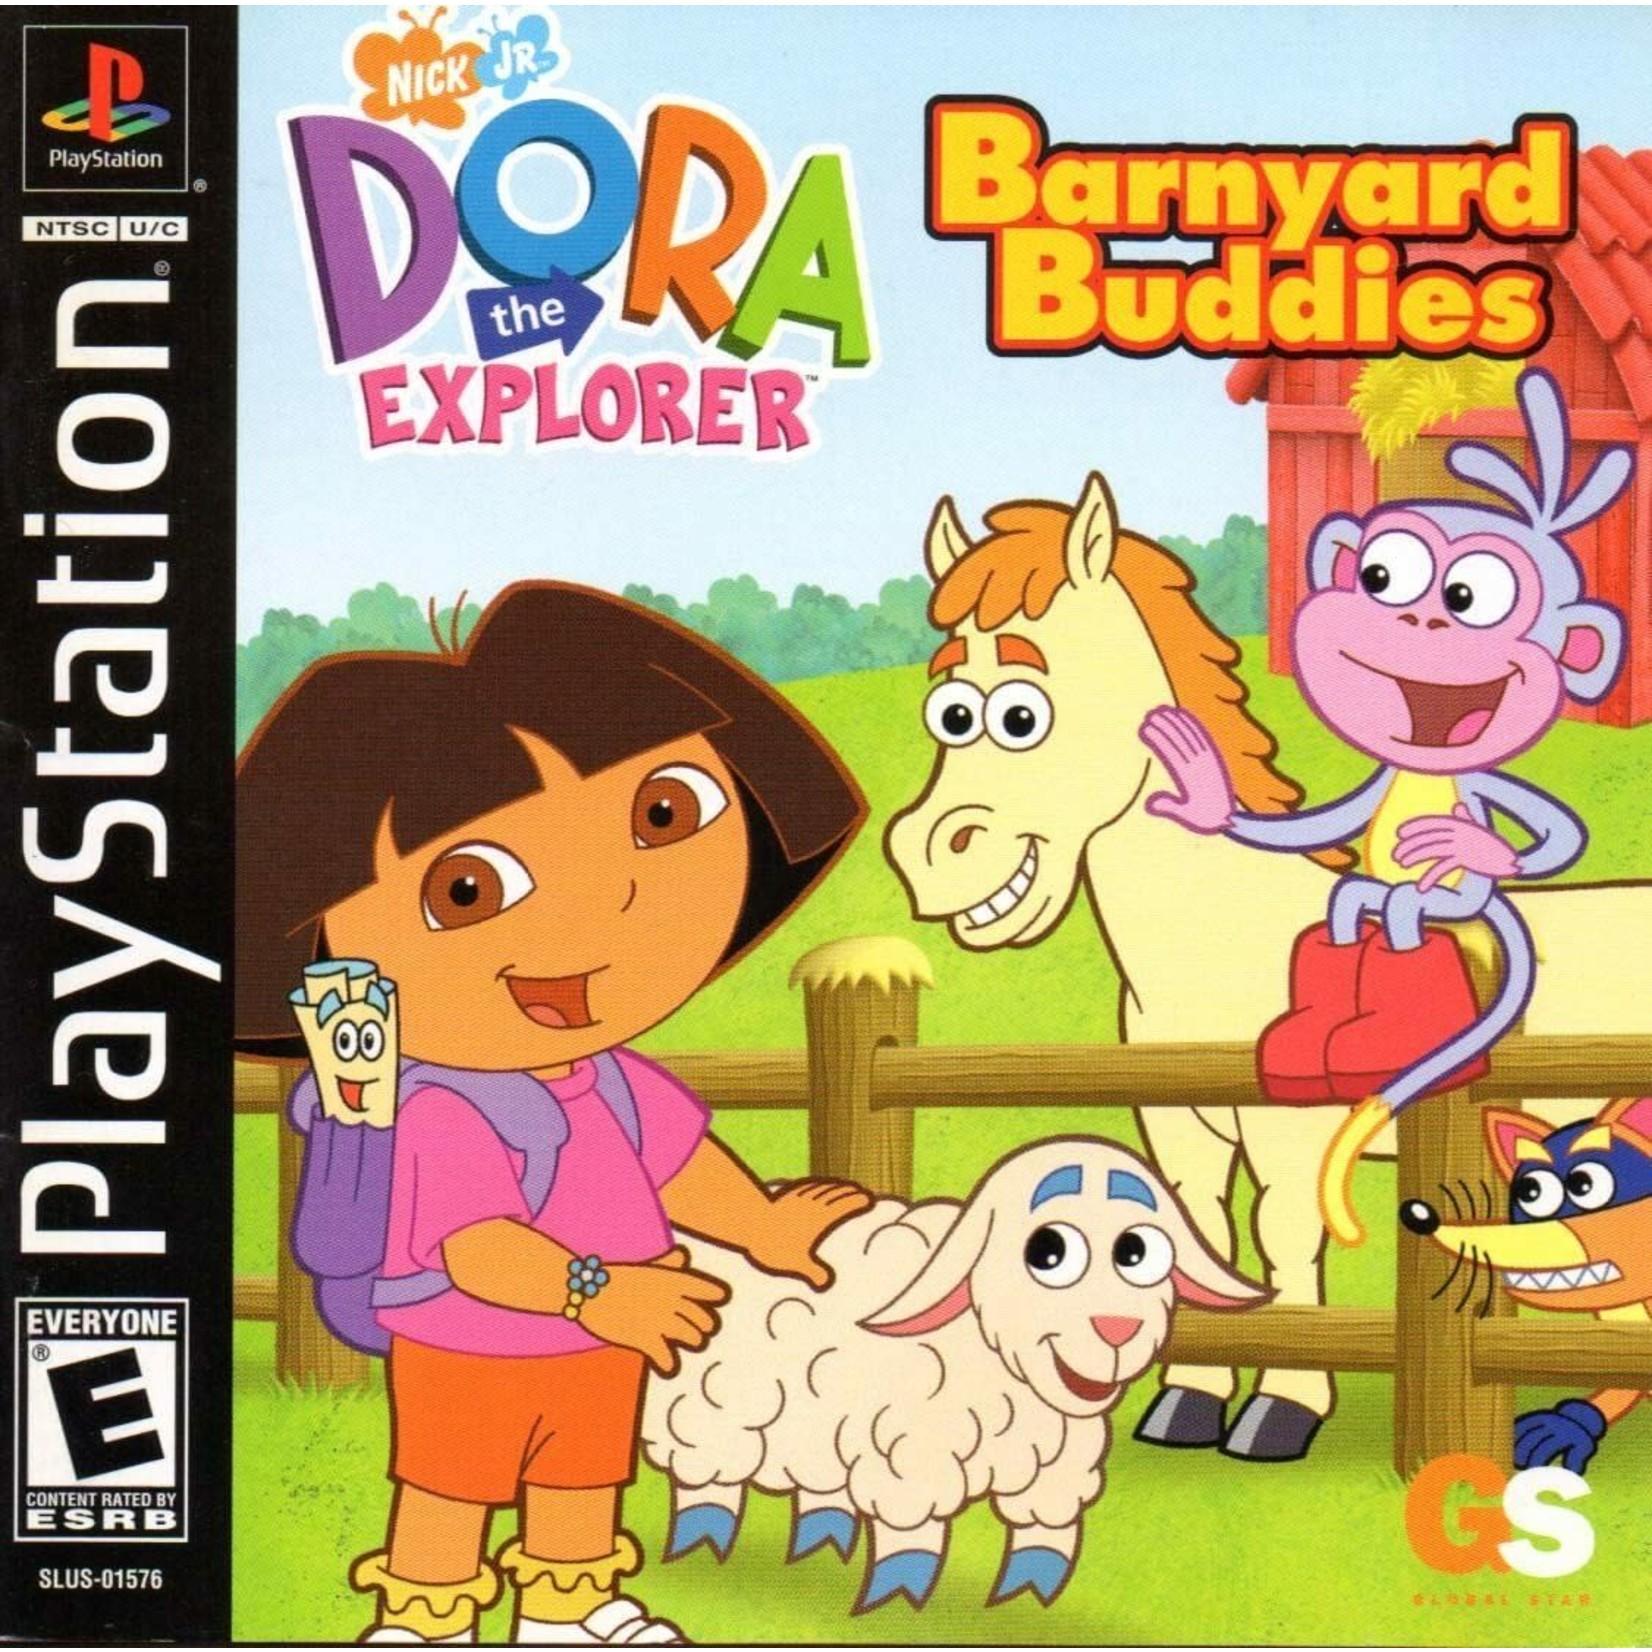 PS1U-Dora The Explorer:Barnyard Buddies